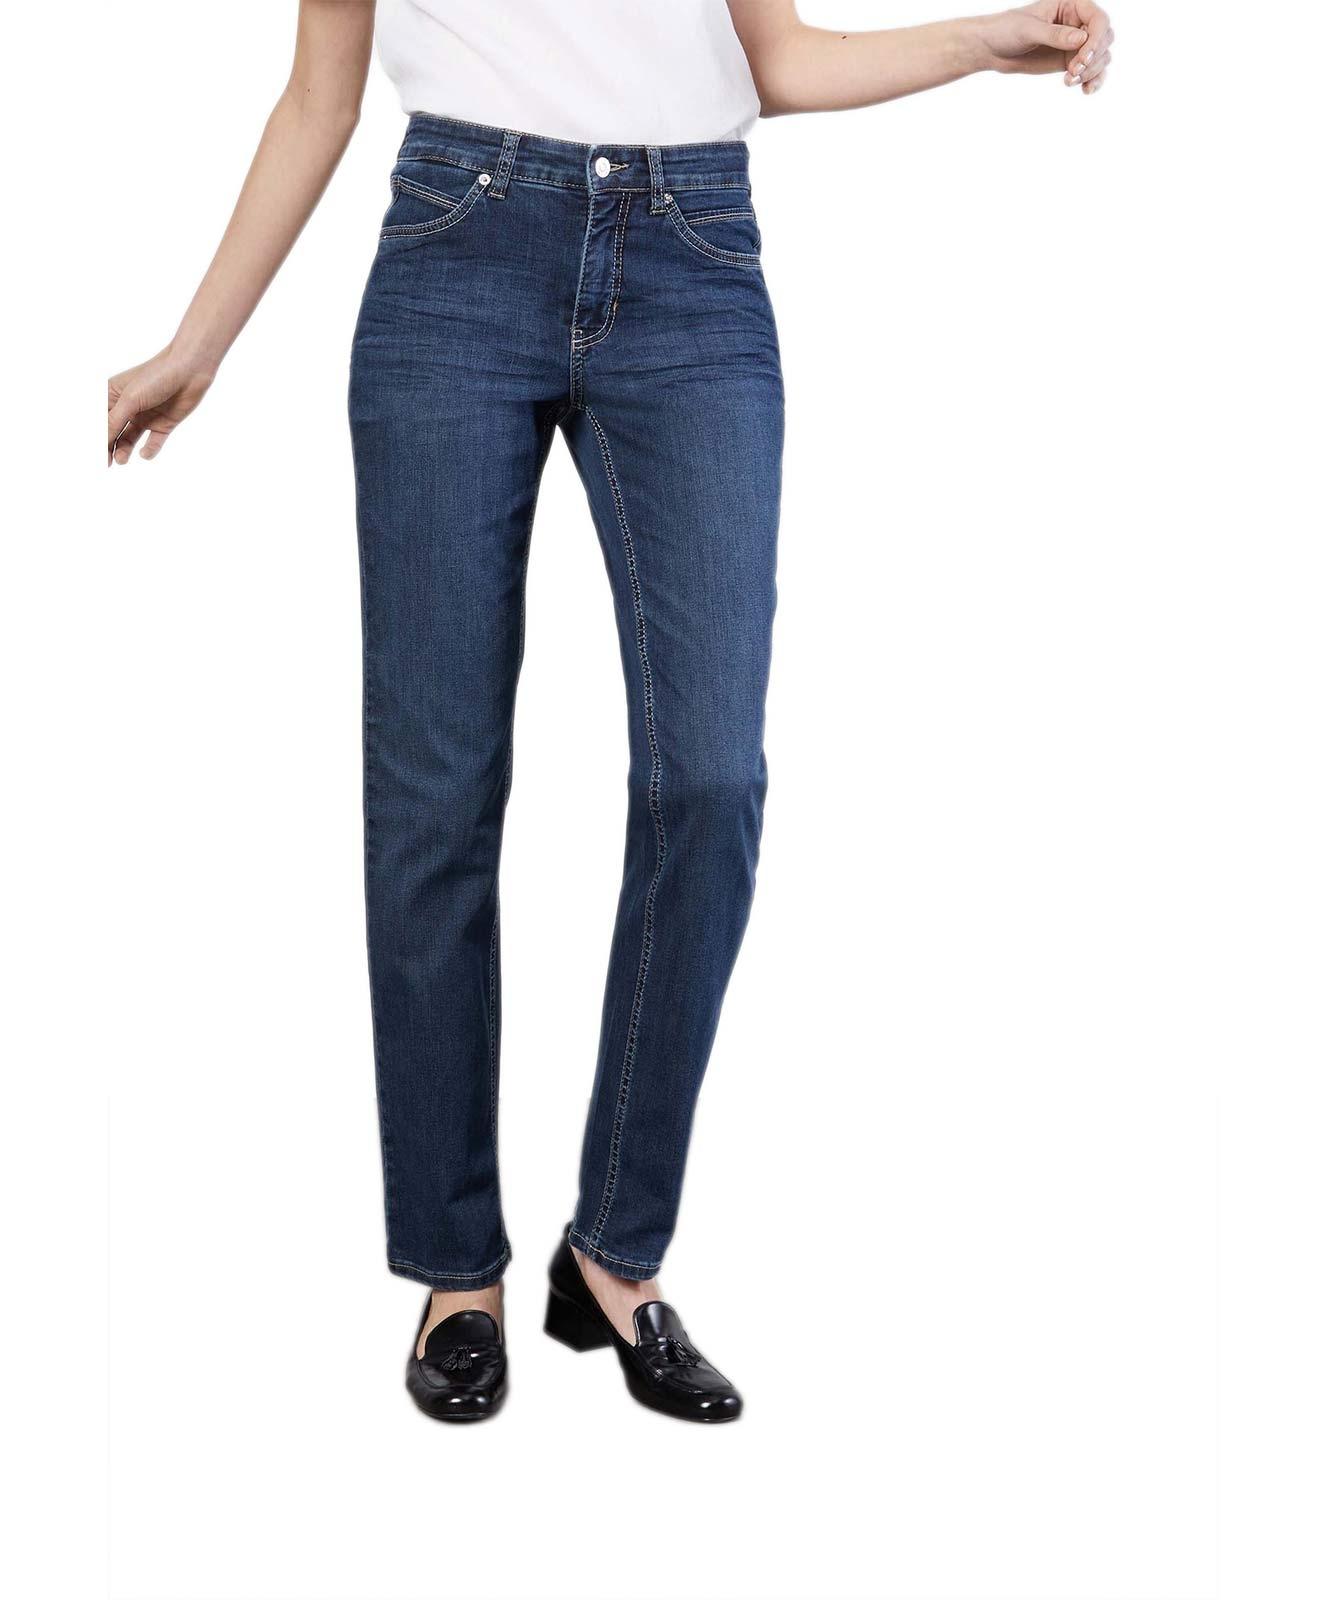 Hosen - MAC Straight Leg Jeans Melanie in New Basic Wash  - Onlineshop Jeans Meile